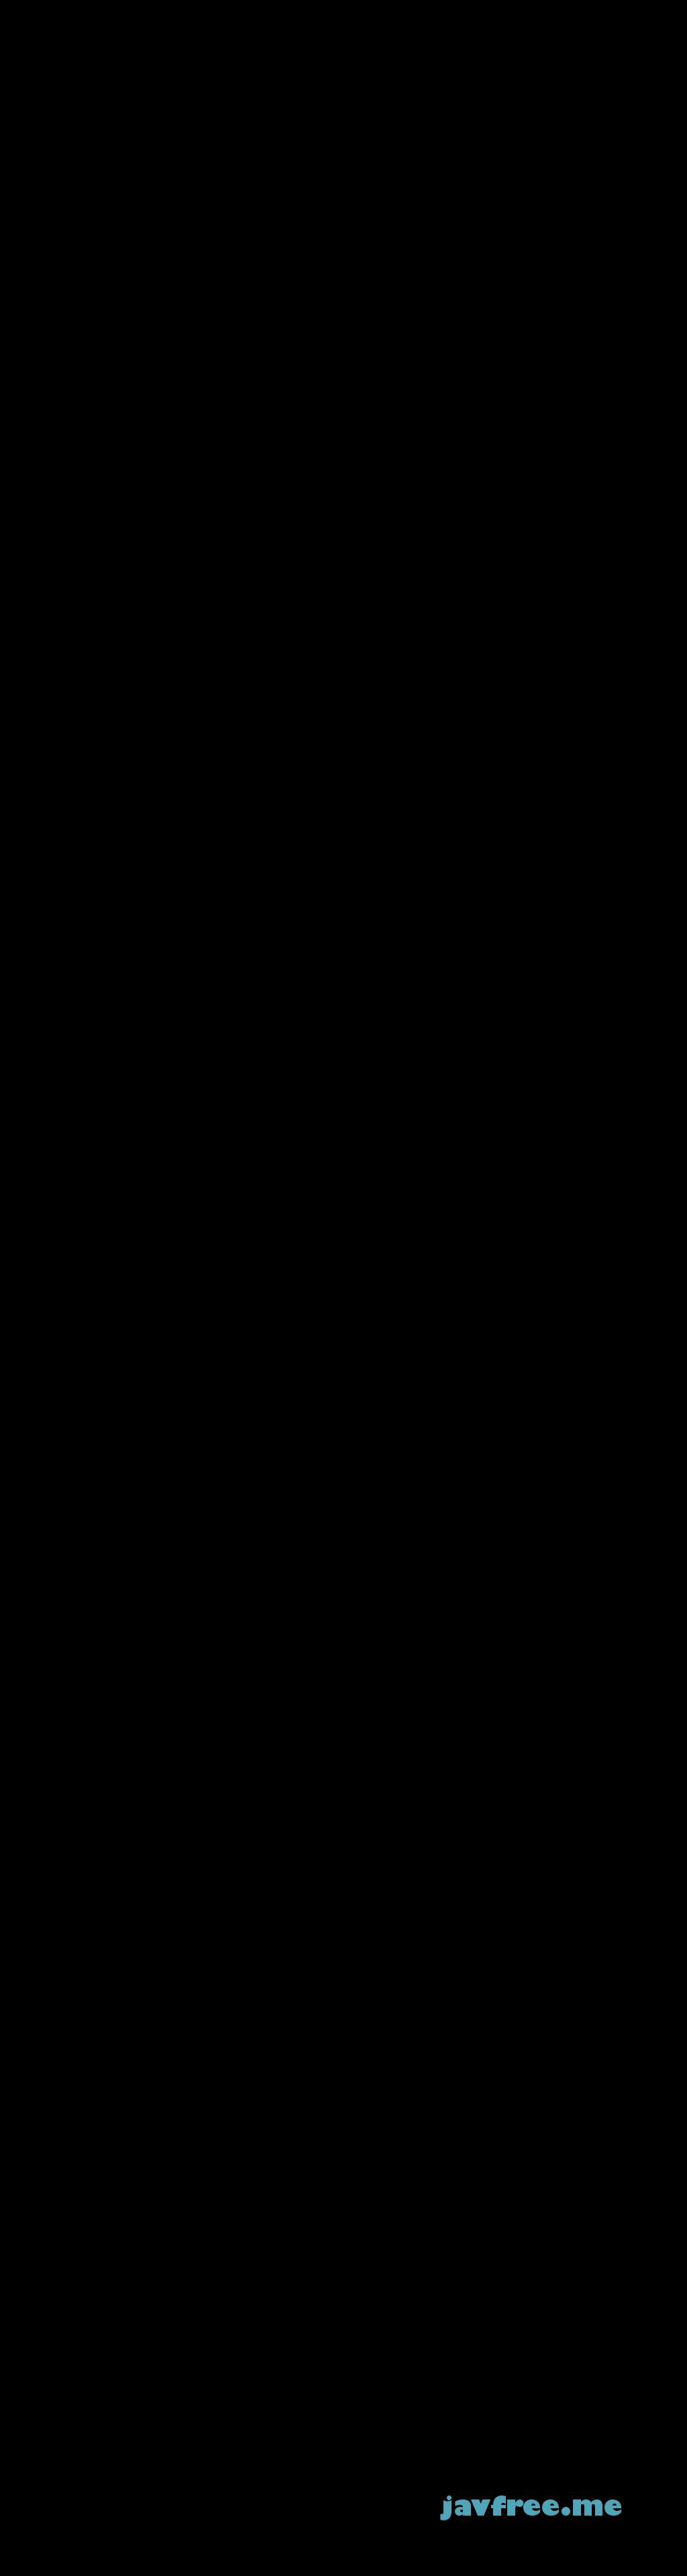 [AAJB 130] 【AV30】完全生涯保存版 永遠なる淫舞 美しき女神たち 青木菜摘 長澤リカ 華山美玲 管野しずか 琴吹さくら 早見カオル 平井柚葉 ふわり つぼみ咲 しいのまお このは AAJB